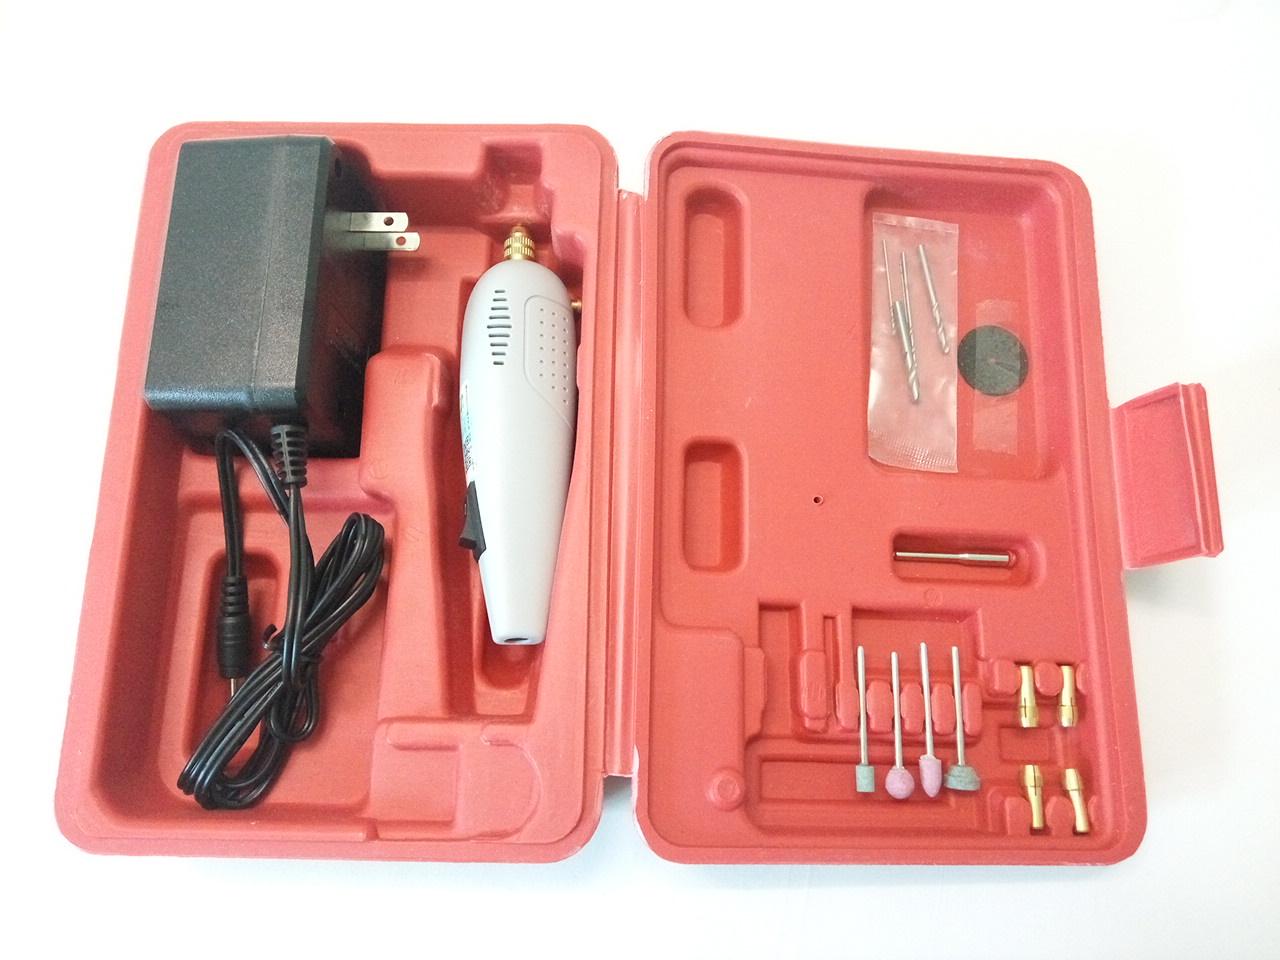 Z3321B105 - Máy khoan máy mài cầm tay mini SLite